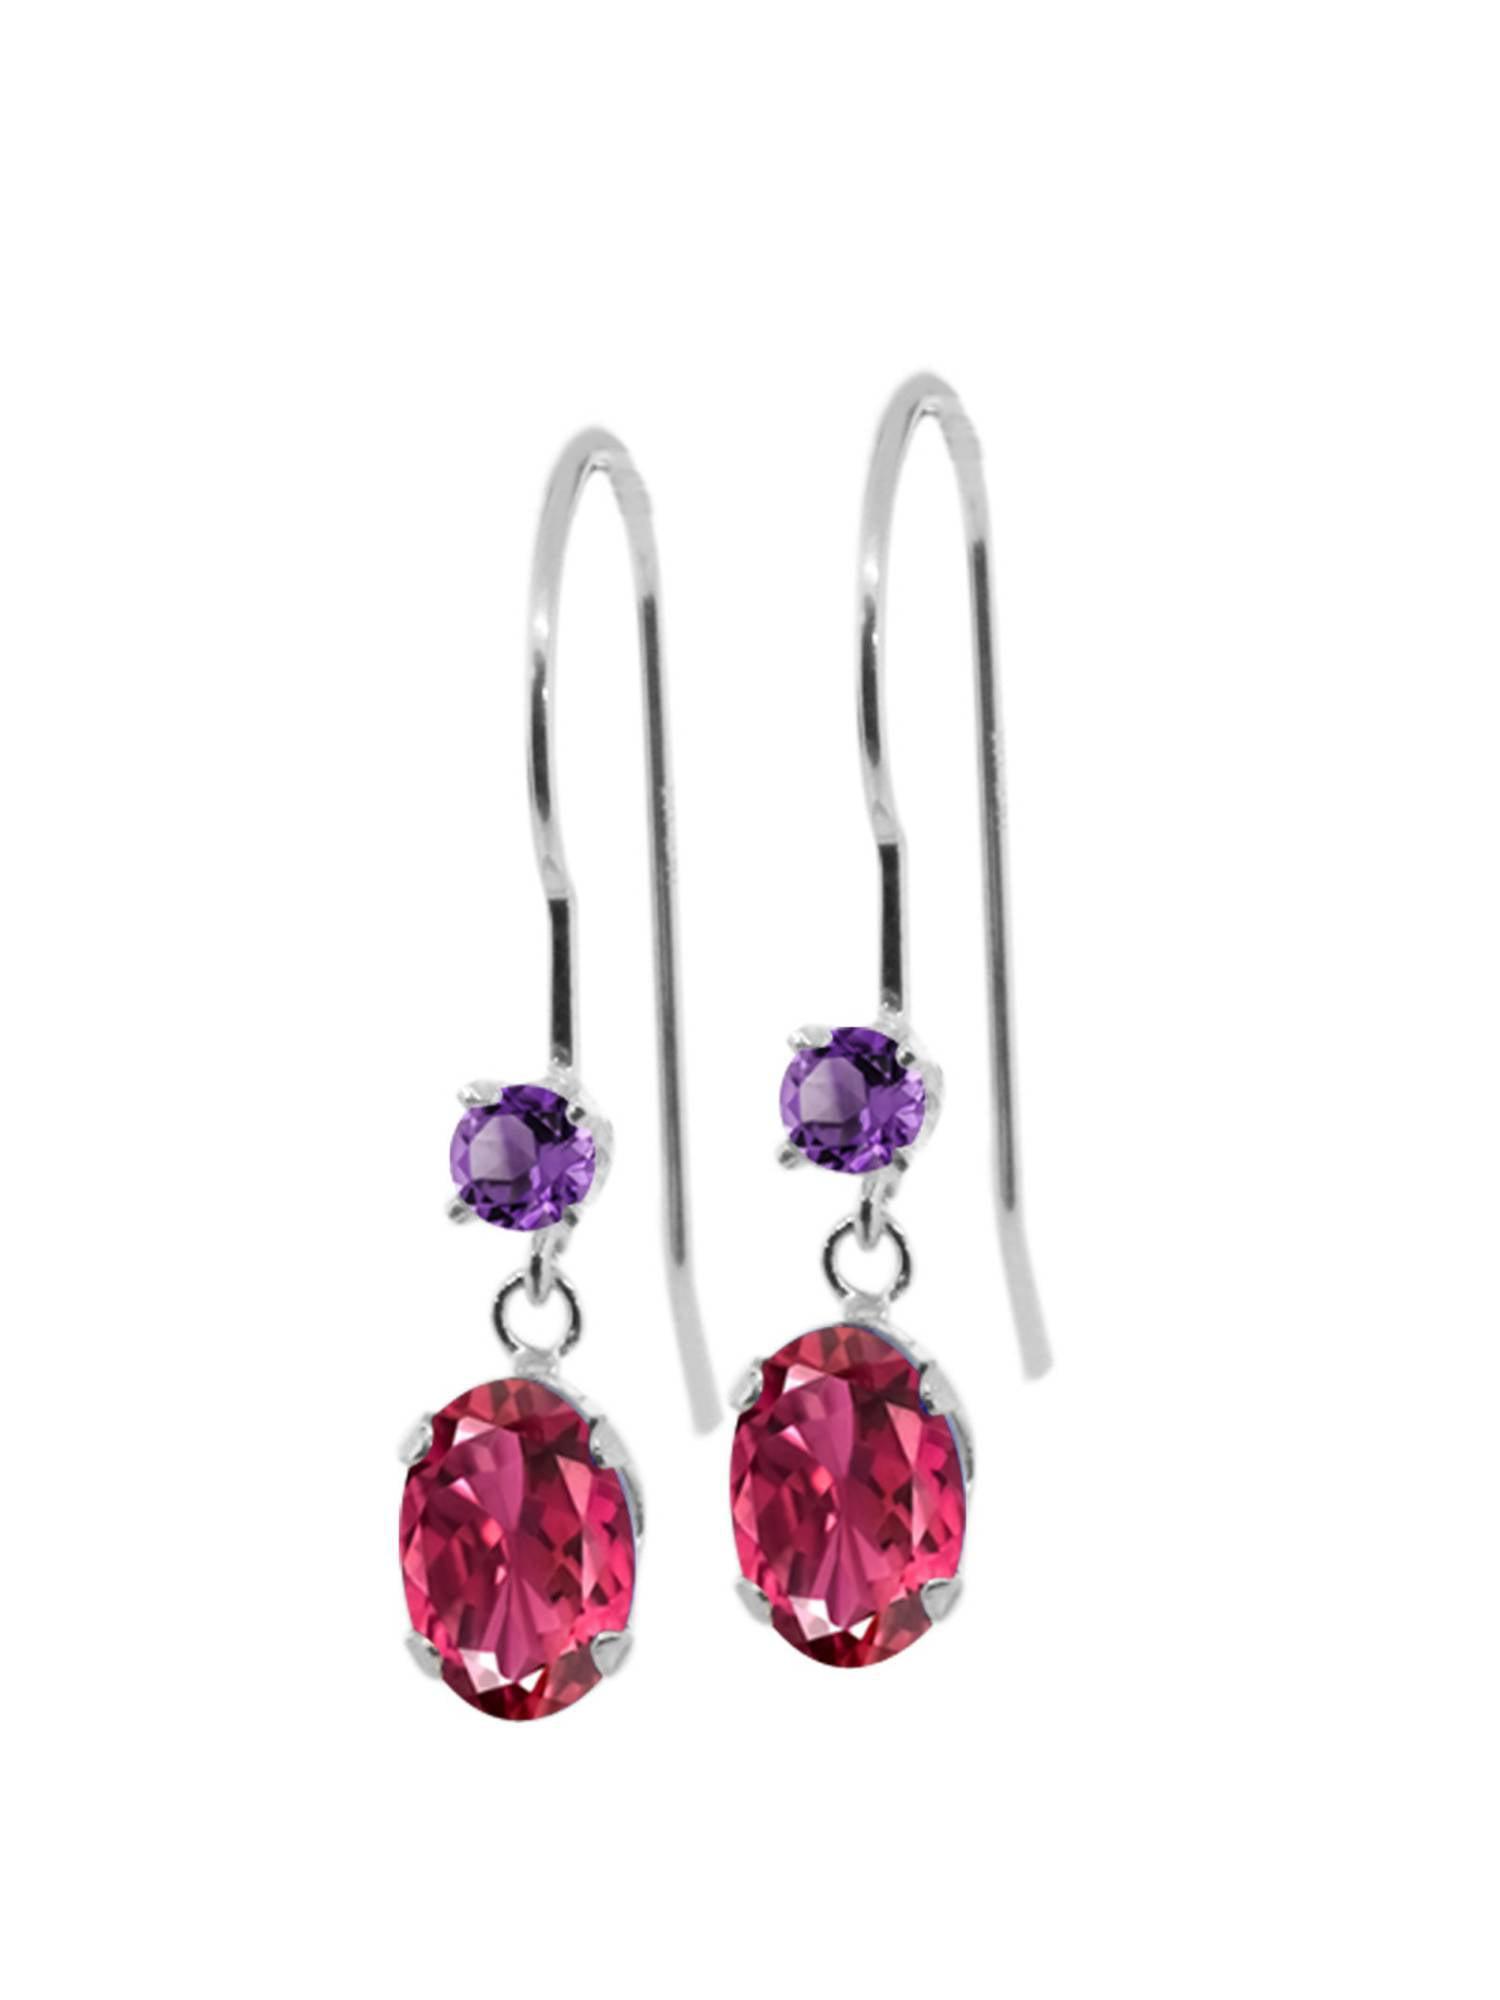 1.12 Ct Oval Pink Tourmaline Purple Amethyst 14K White Gold Earrings by